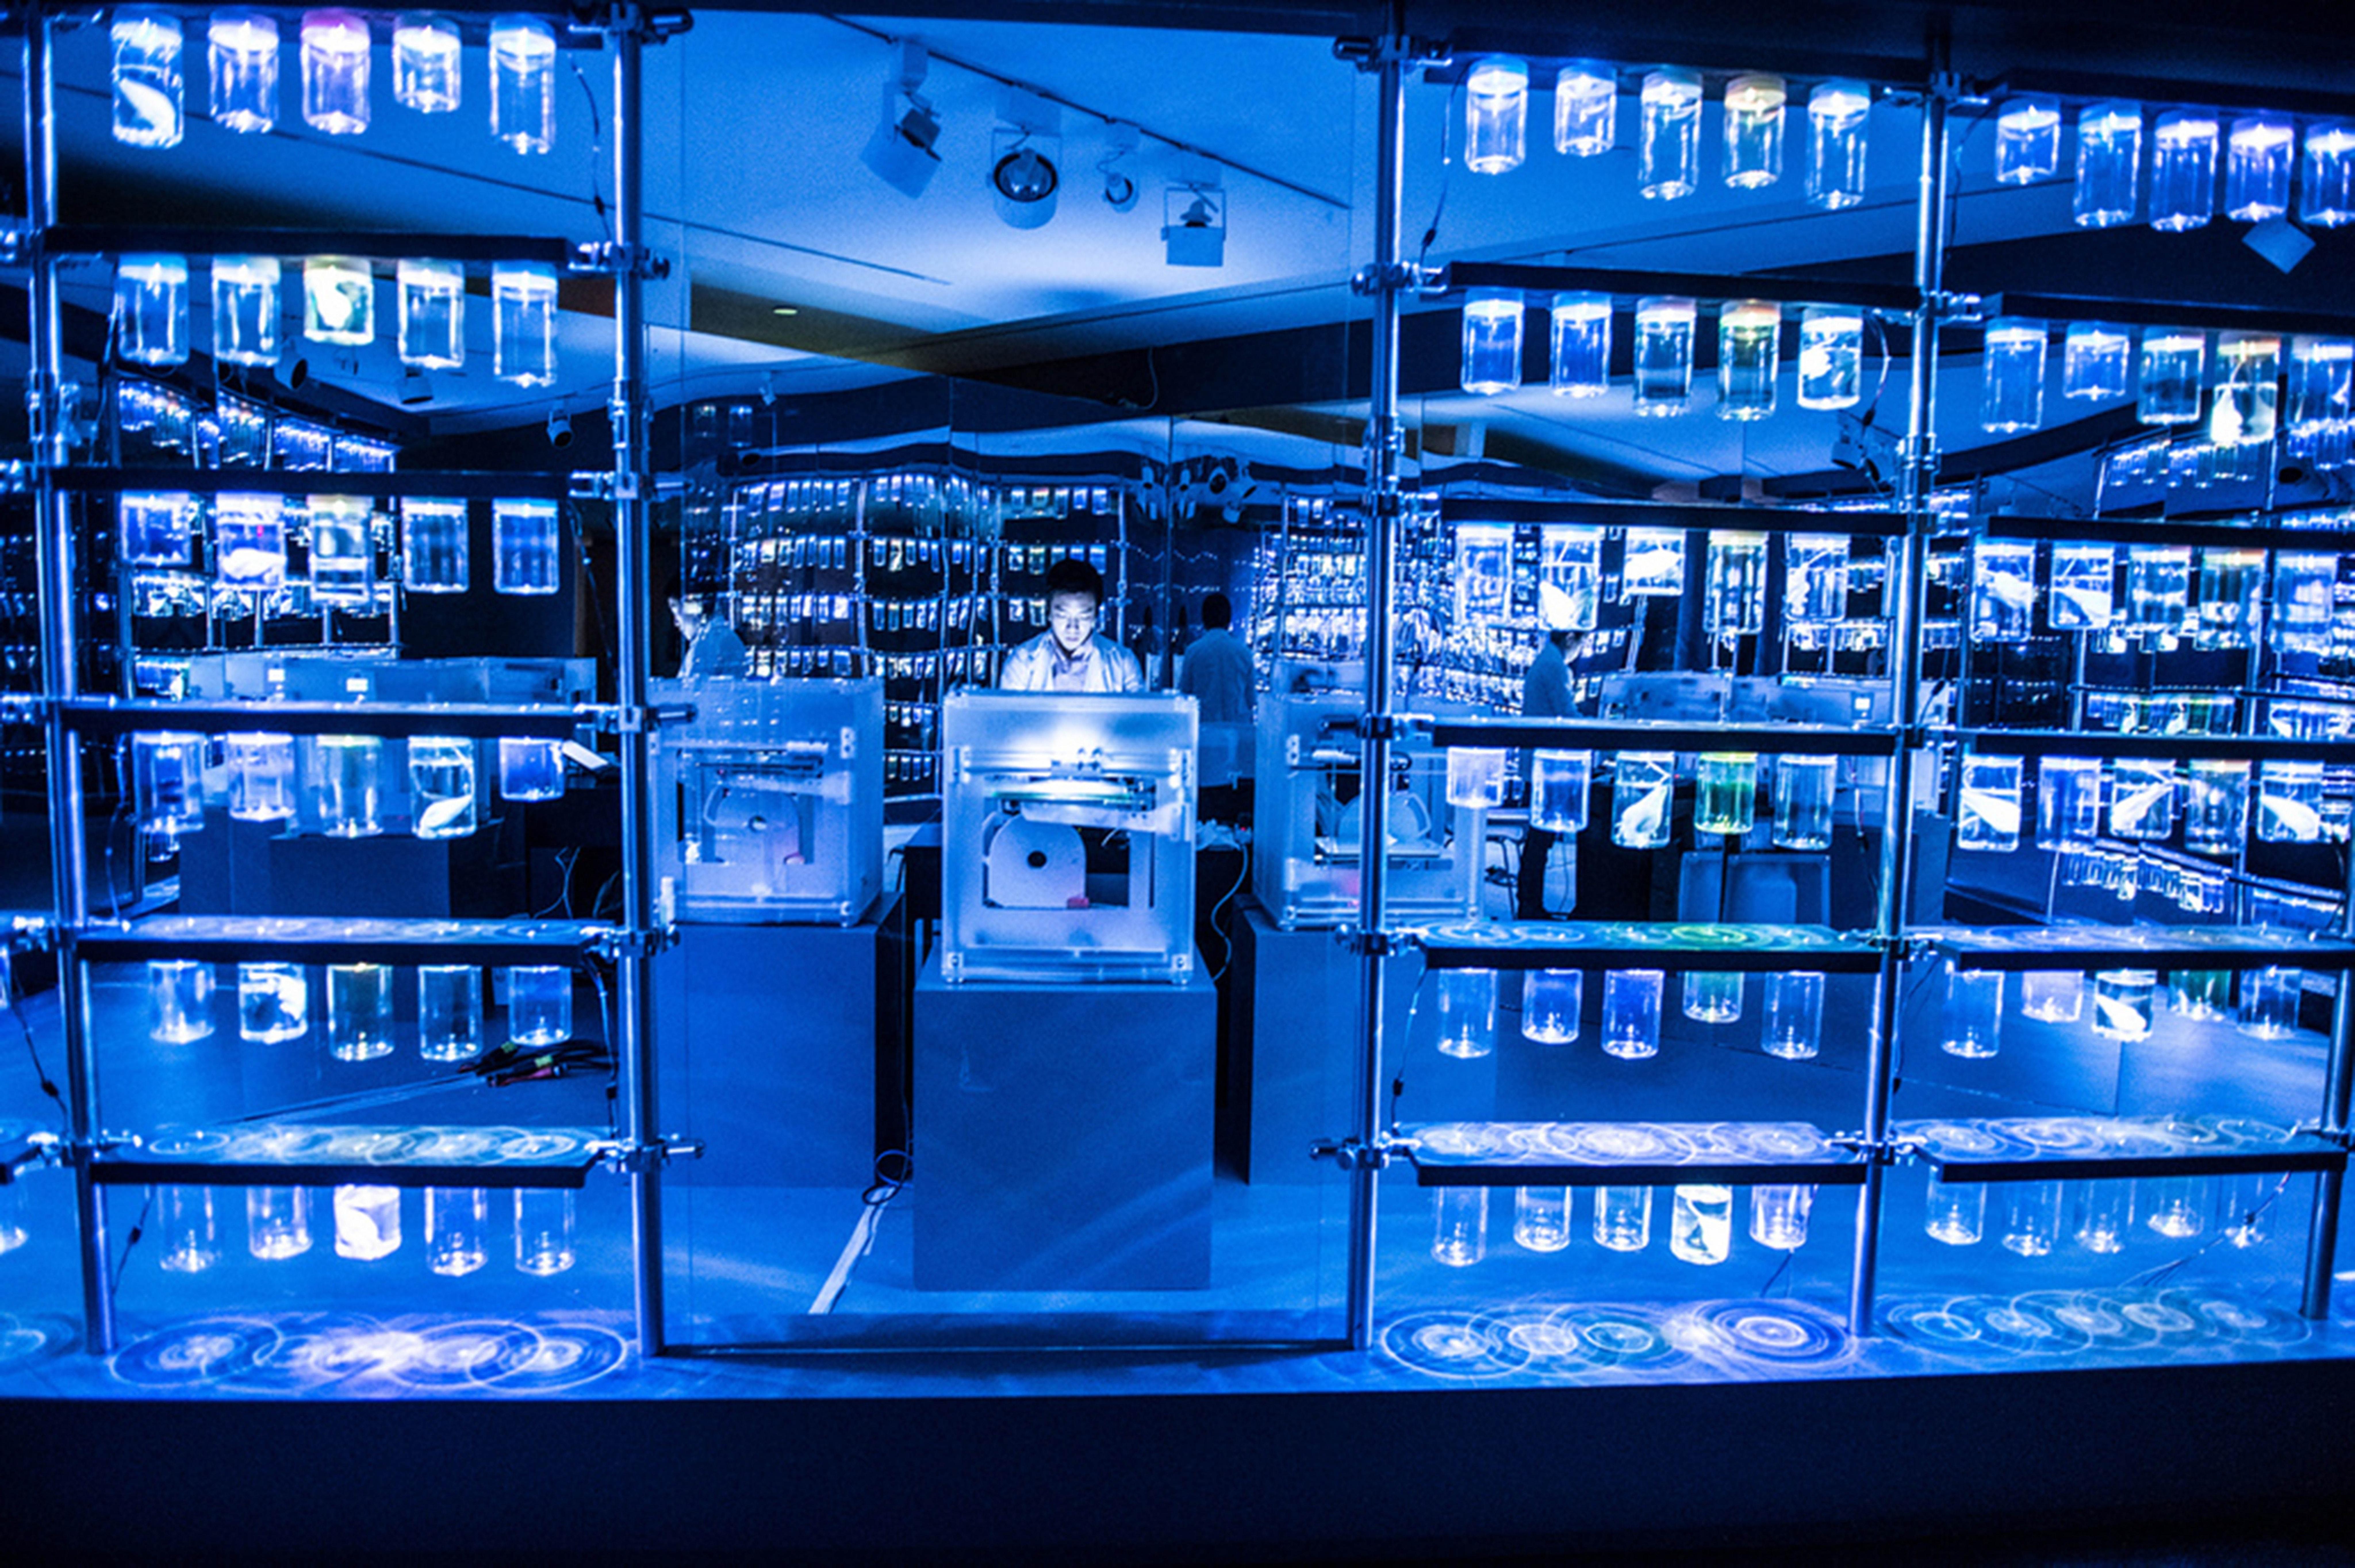 Bang Hai Technologies